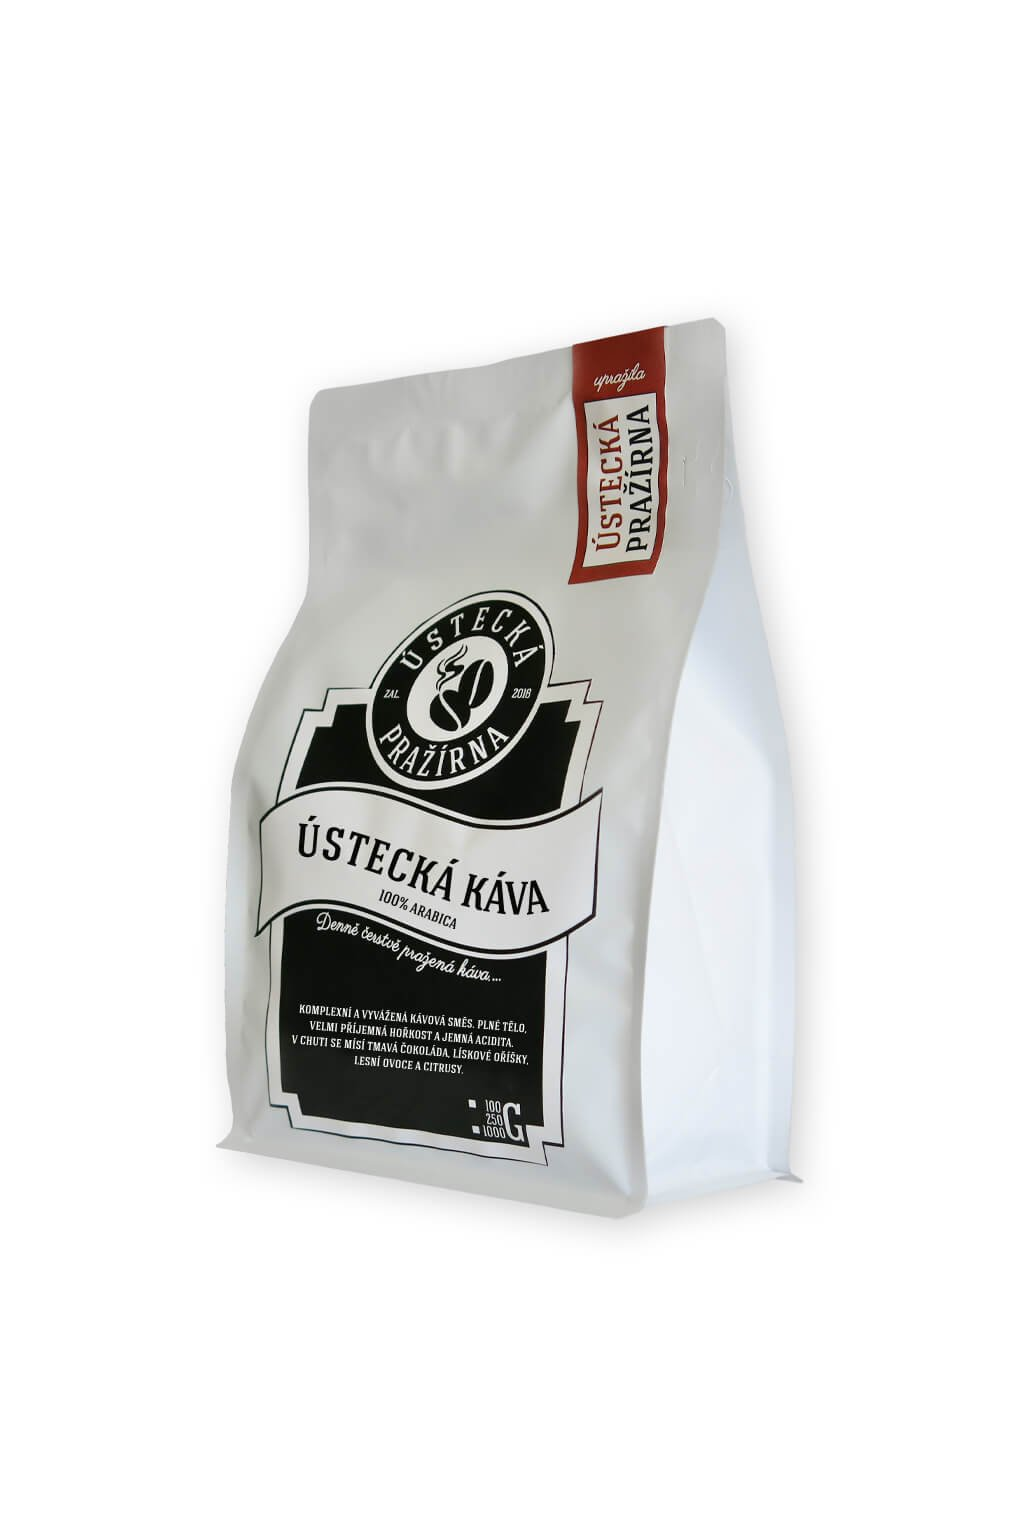 01 02 04 01 smes ustecka kava